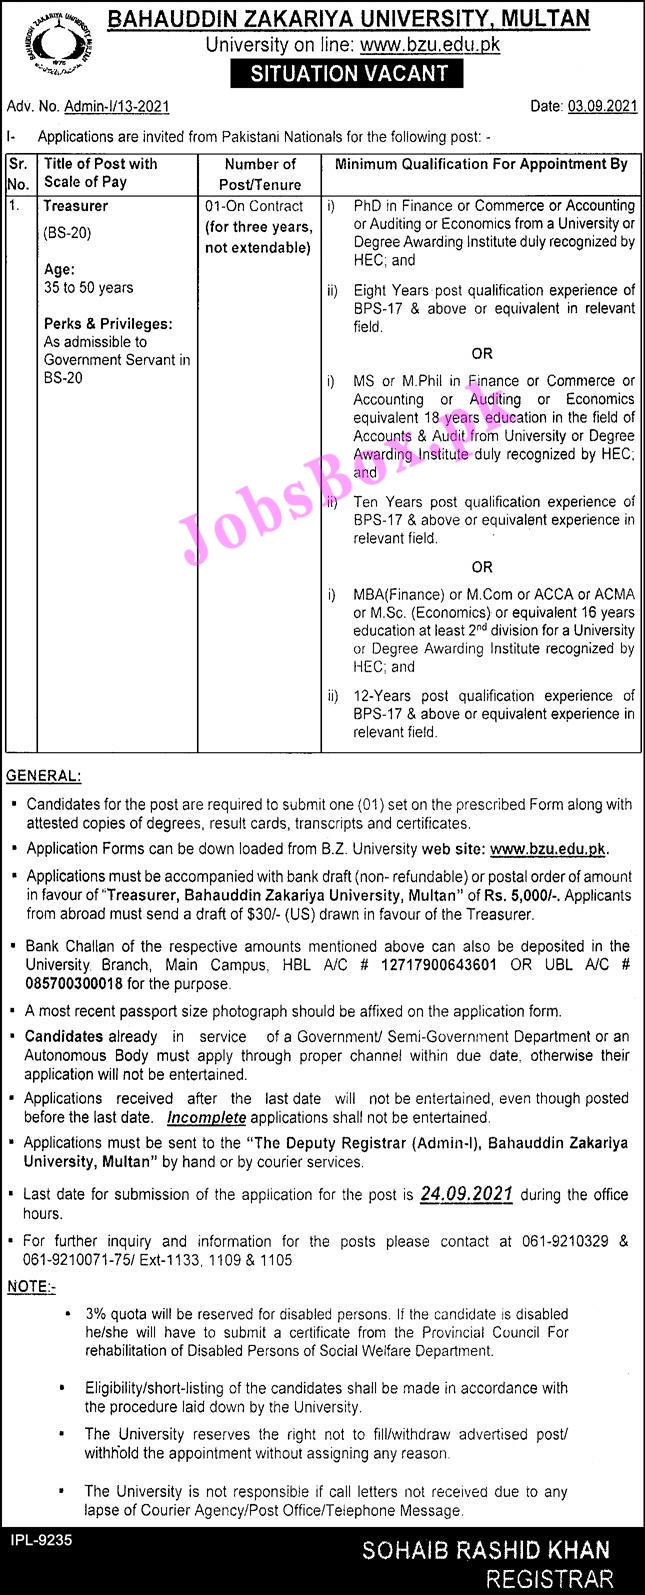 Bahauddin Zakariya University BZU Multan Jobs 2021 - Online Apply